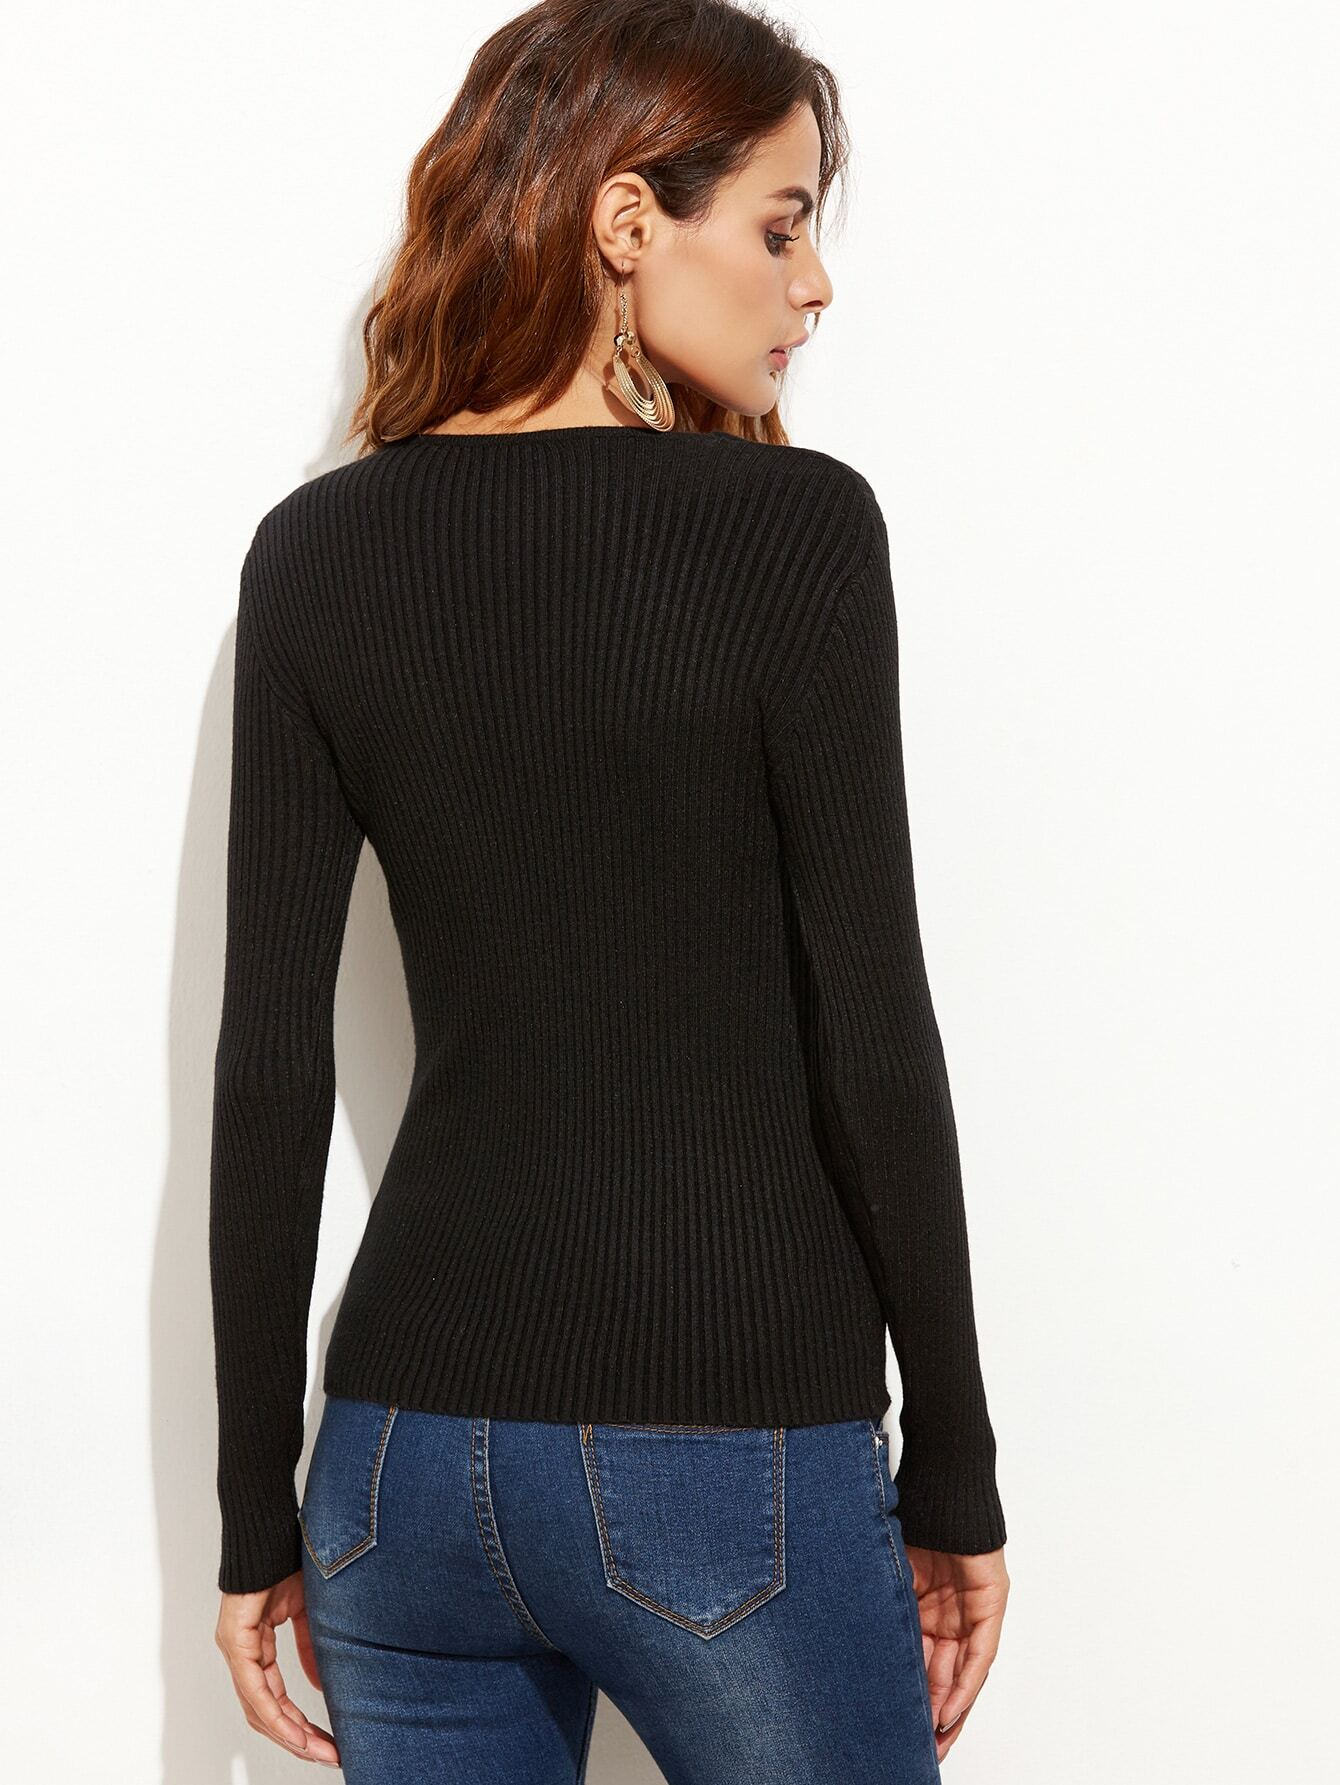 sweater160928004_2